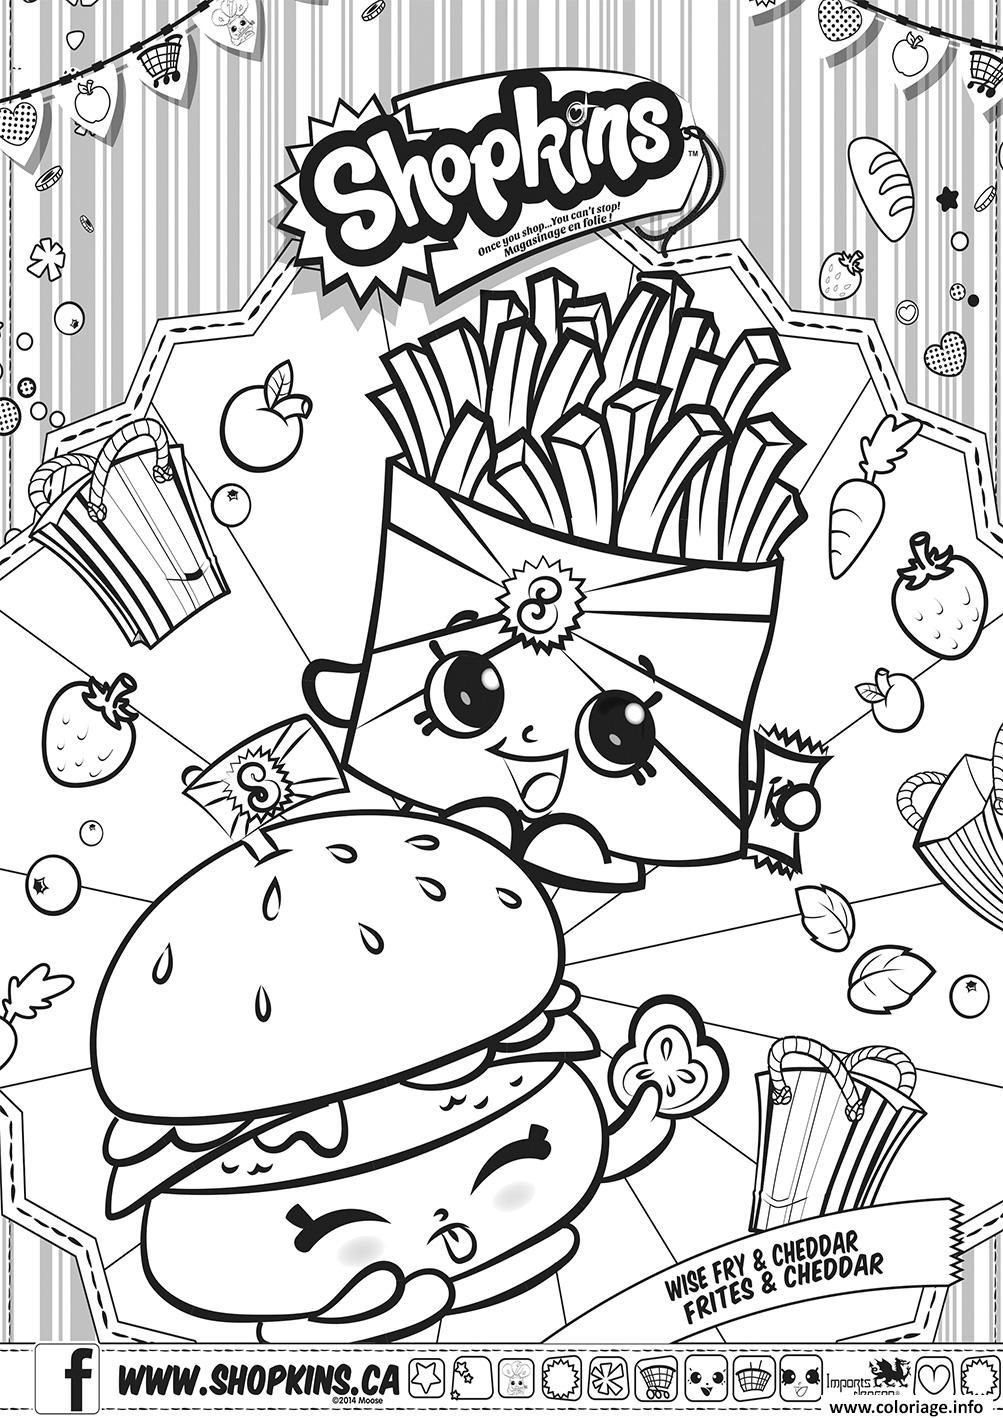 Coloriage shopkins wise fry cheddar bilingual dessin - Coloriage de petshop a imprimer gratuit ...